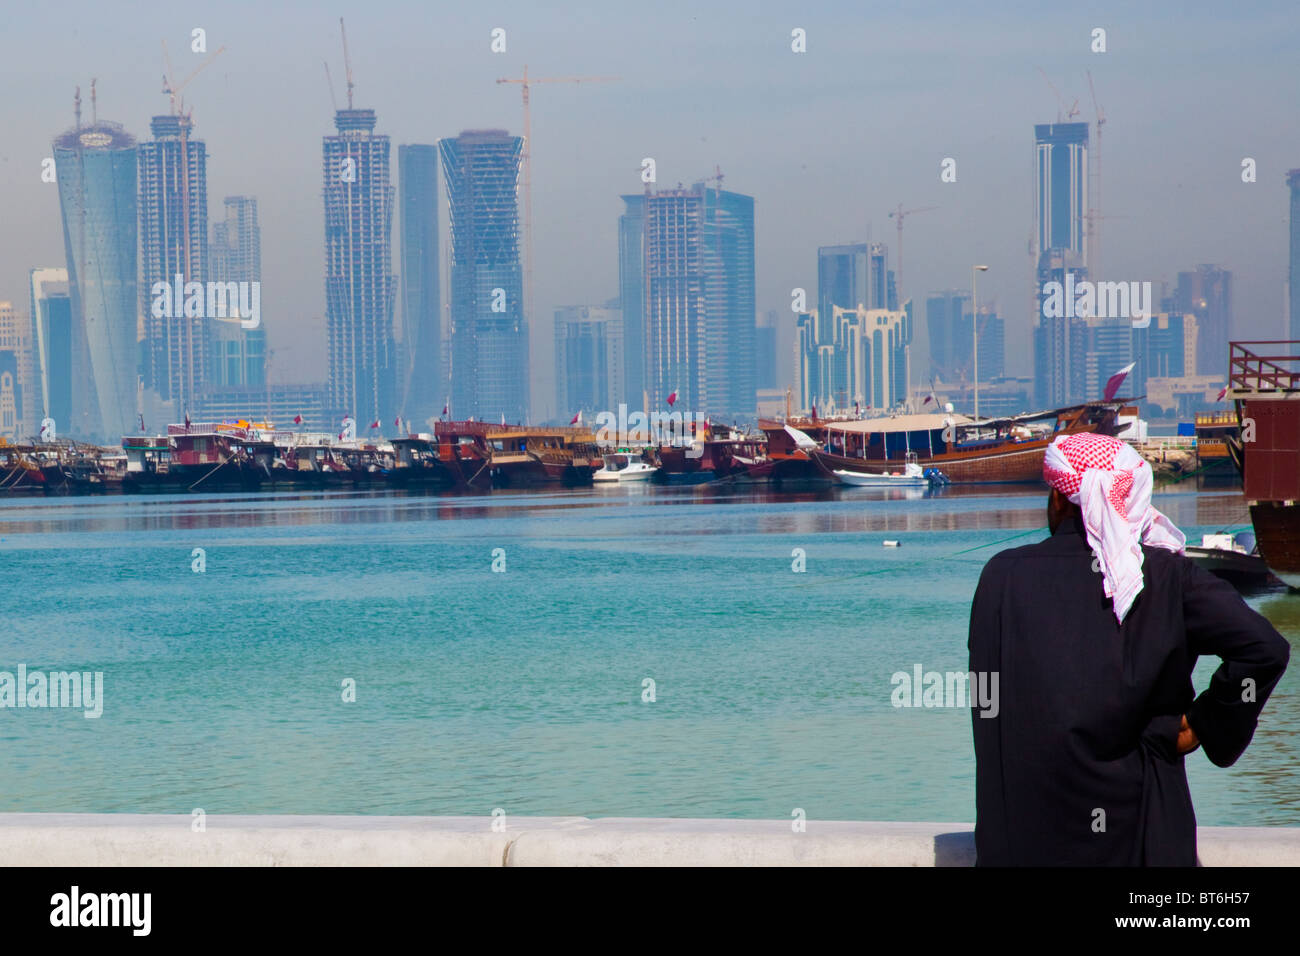 Horizonte de rascacielos en Doha (Qatar) Imagen De Stock